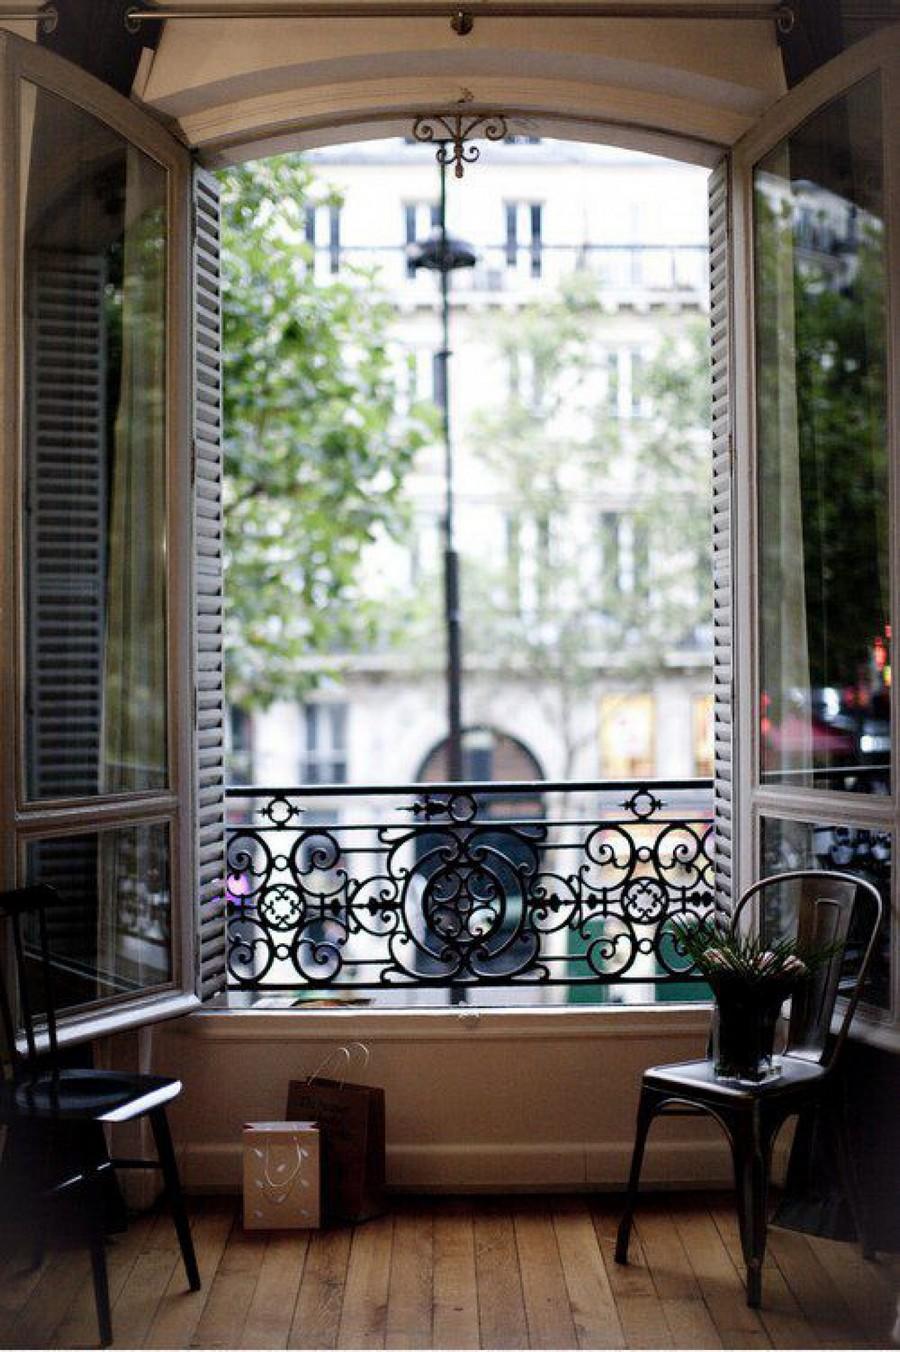 39-beautiful-balconet-balconette-Juliet-balcony-in-interior-design-wrough-metal-railing-forgery-barrier